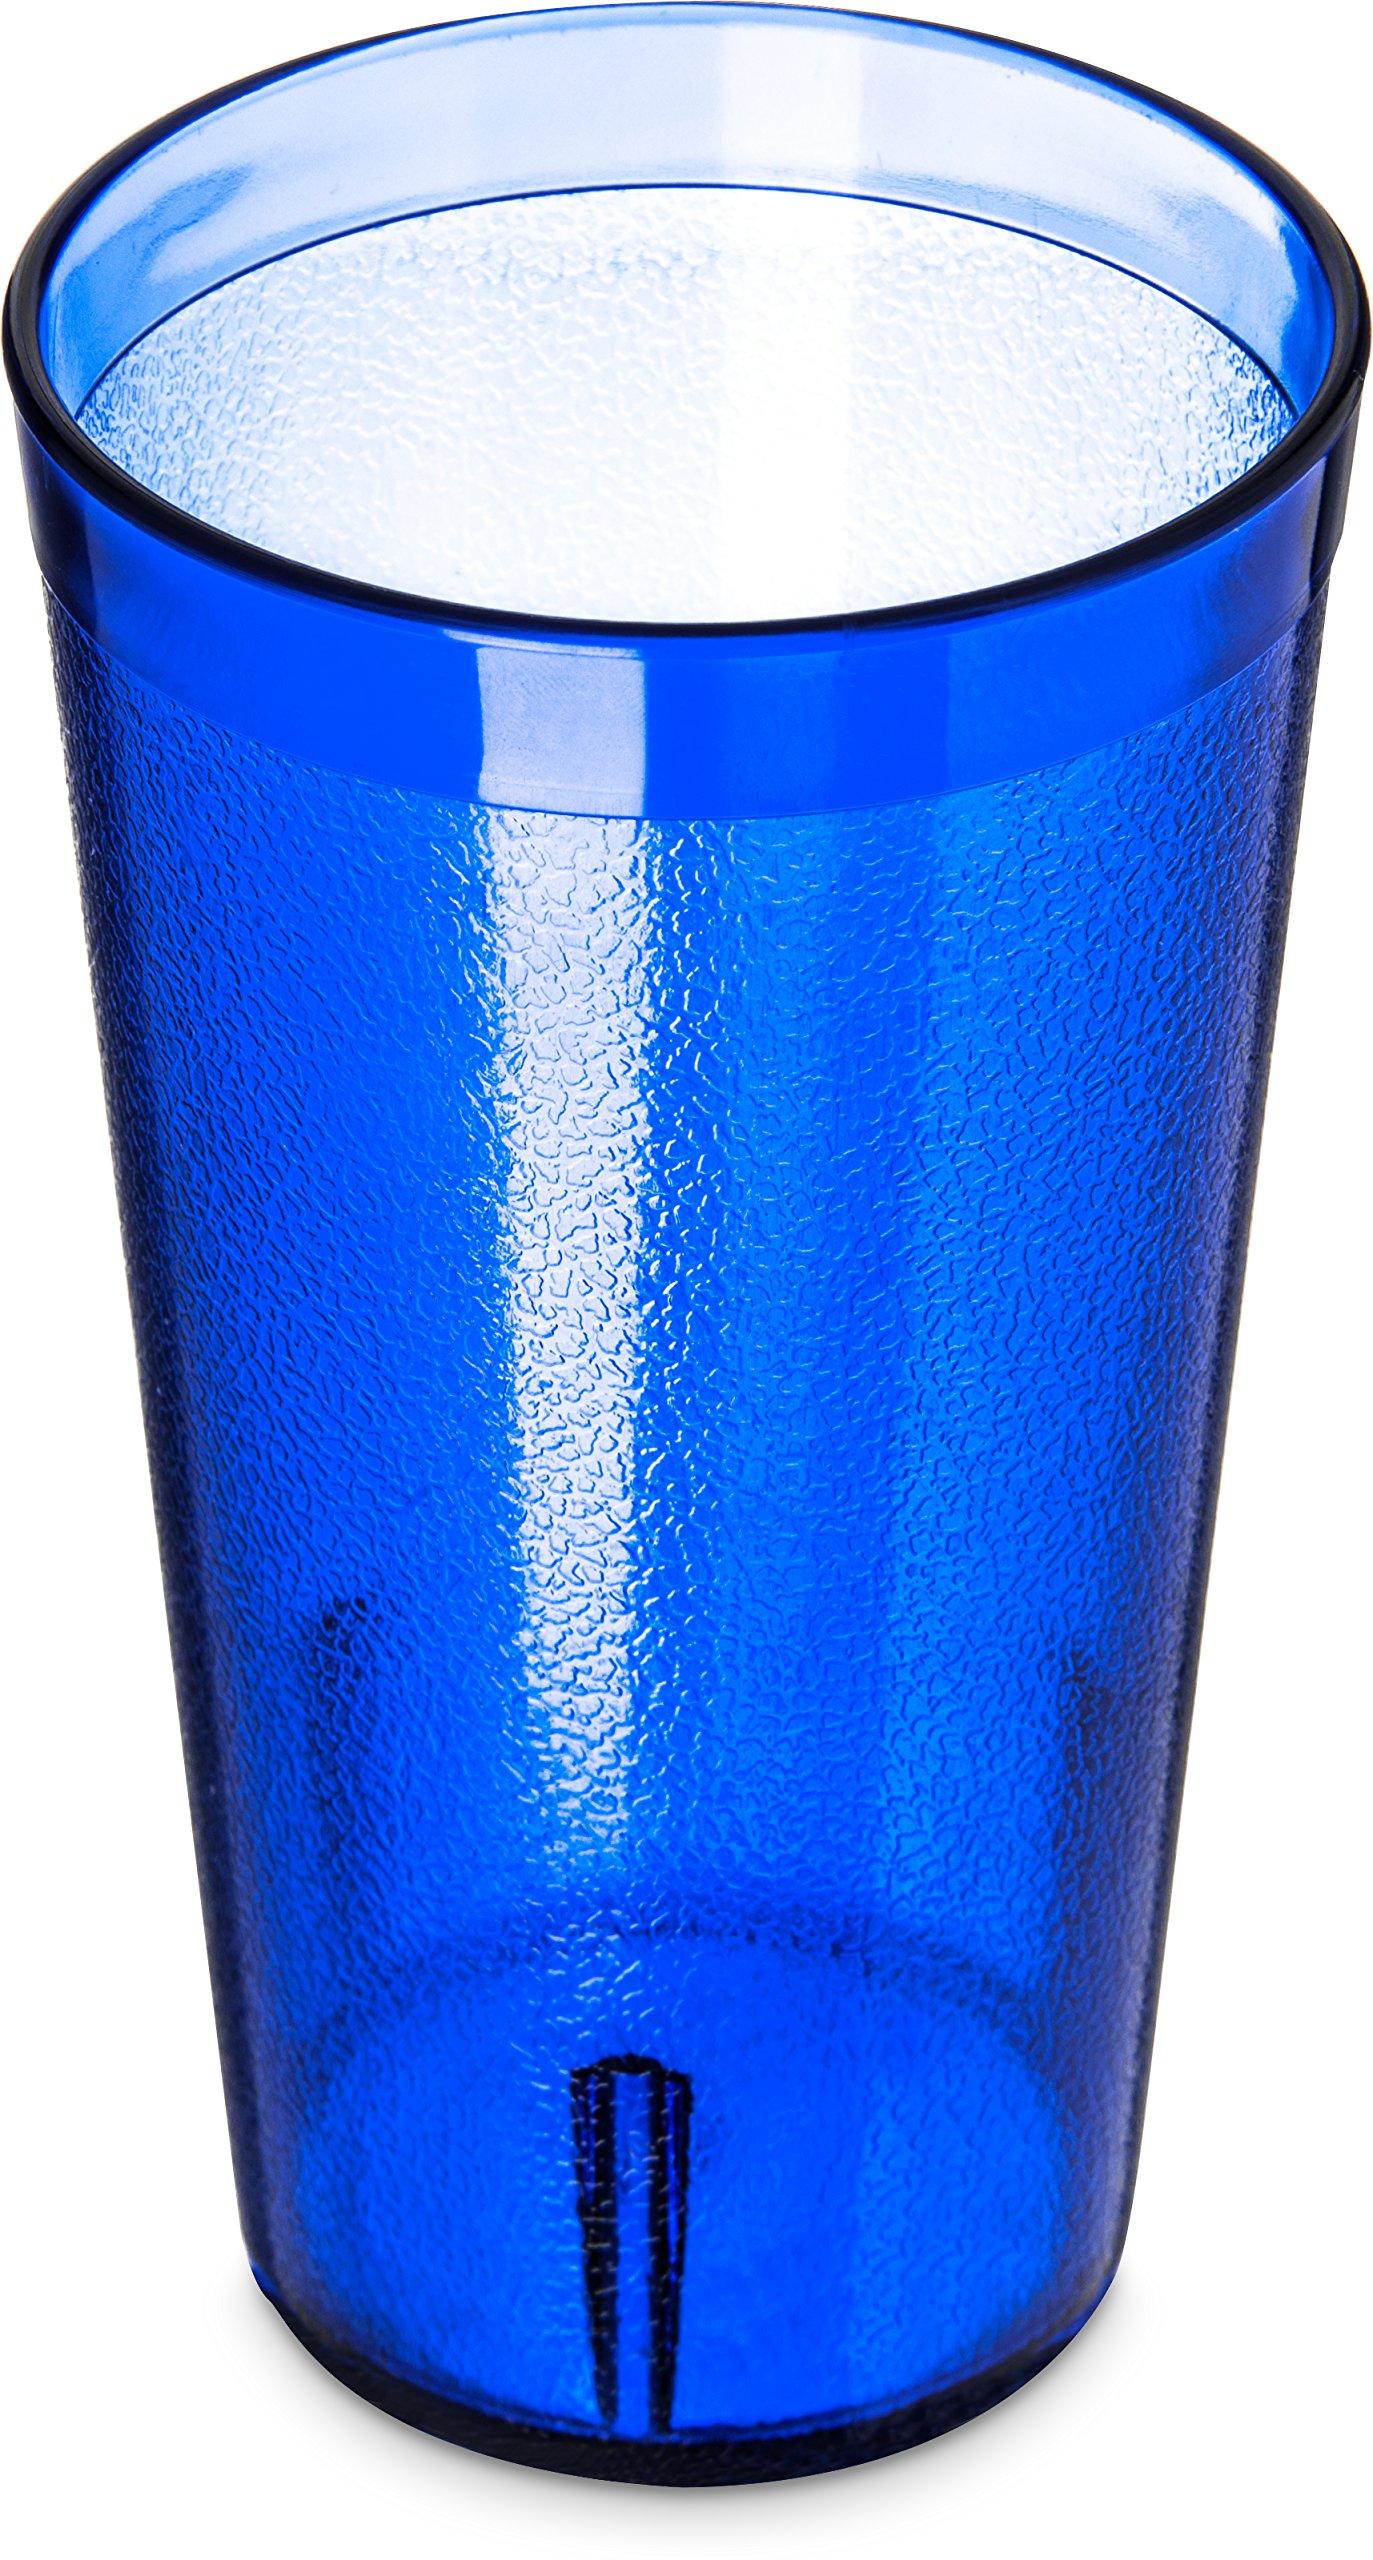 Carlisle 5216-8247 BPA Free Plastic Stackable Tumbler, 16 oz., Royal Blue (Pack of 6)